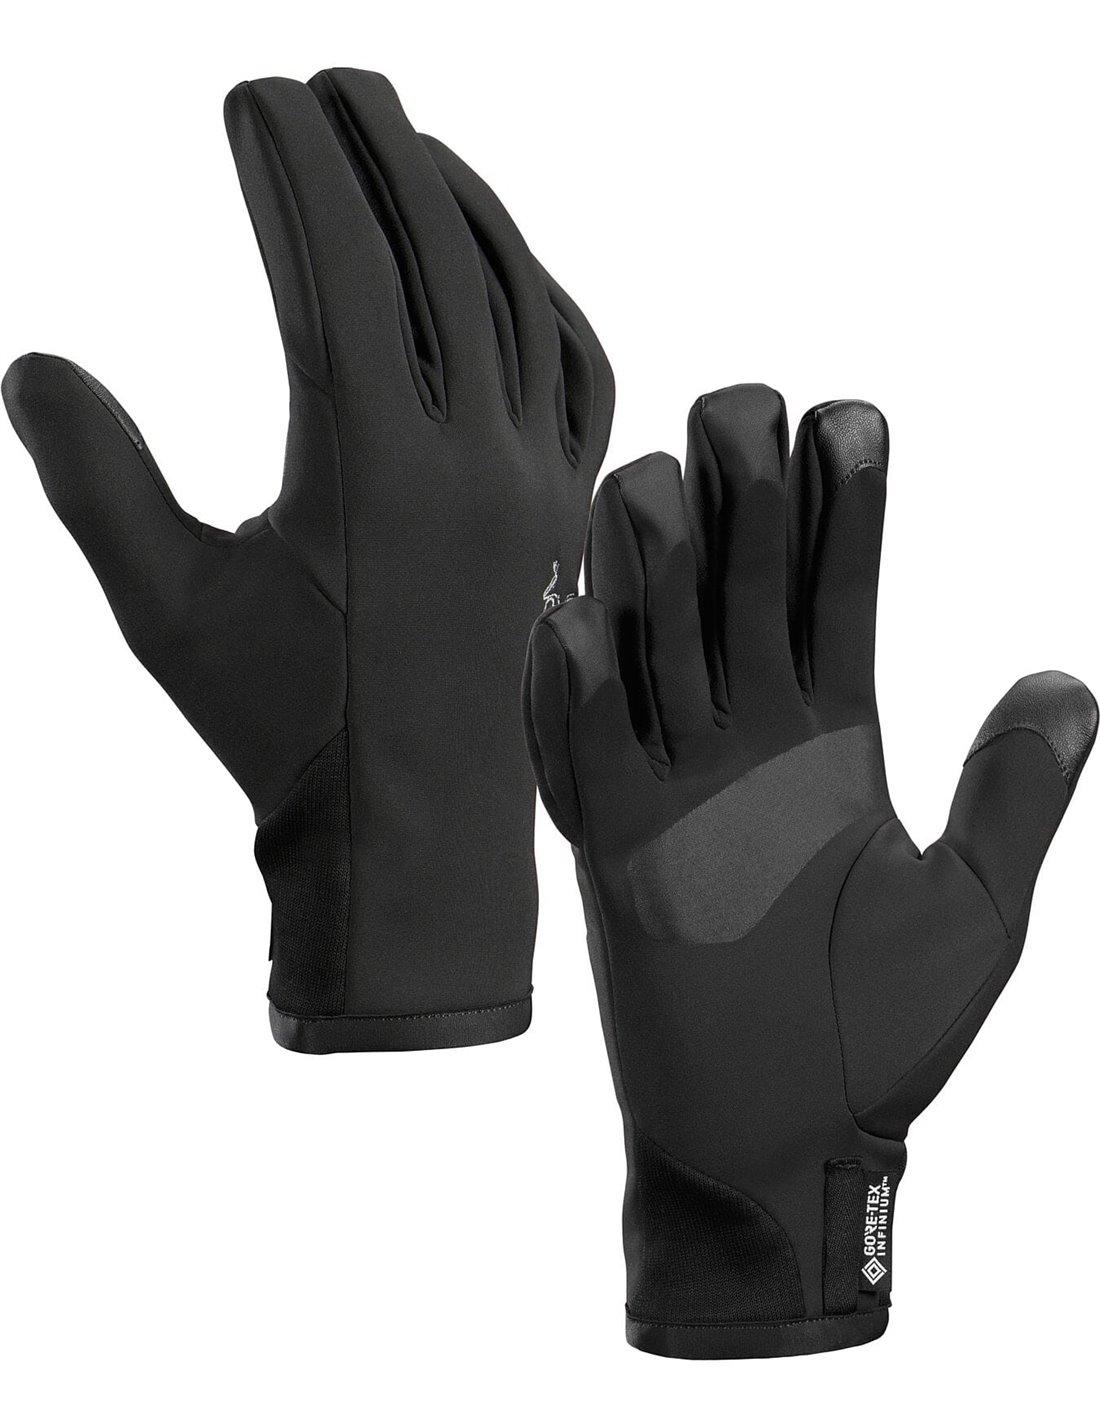 Arcteryx Venta Glove